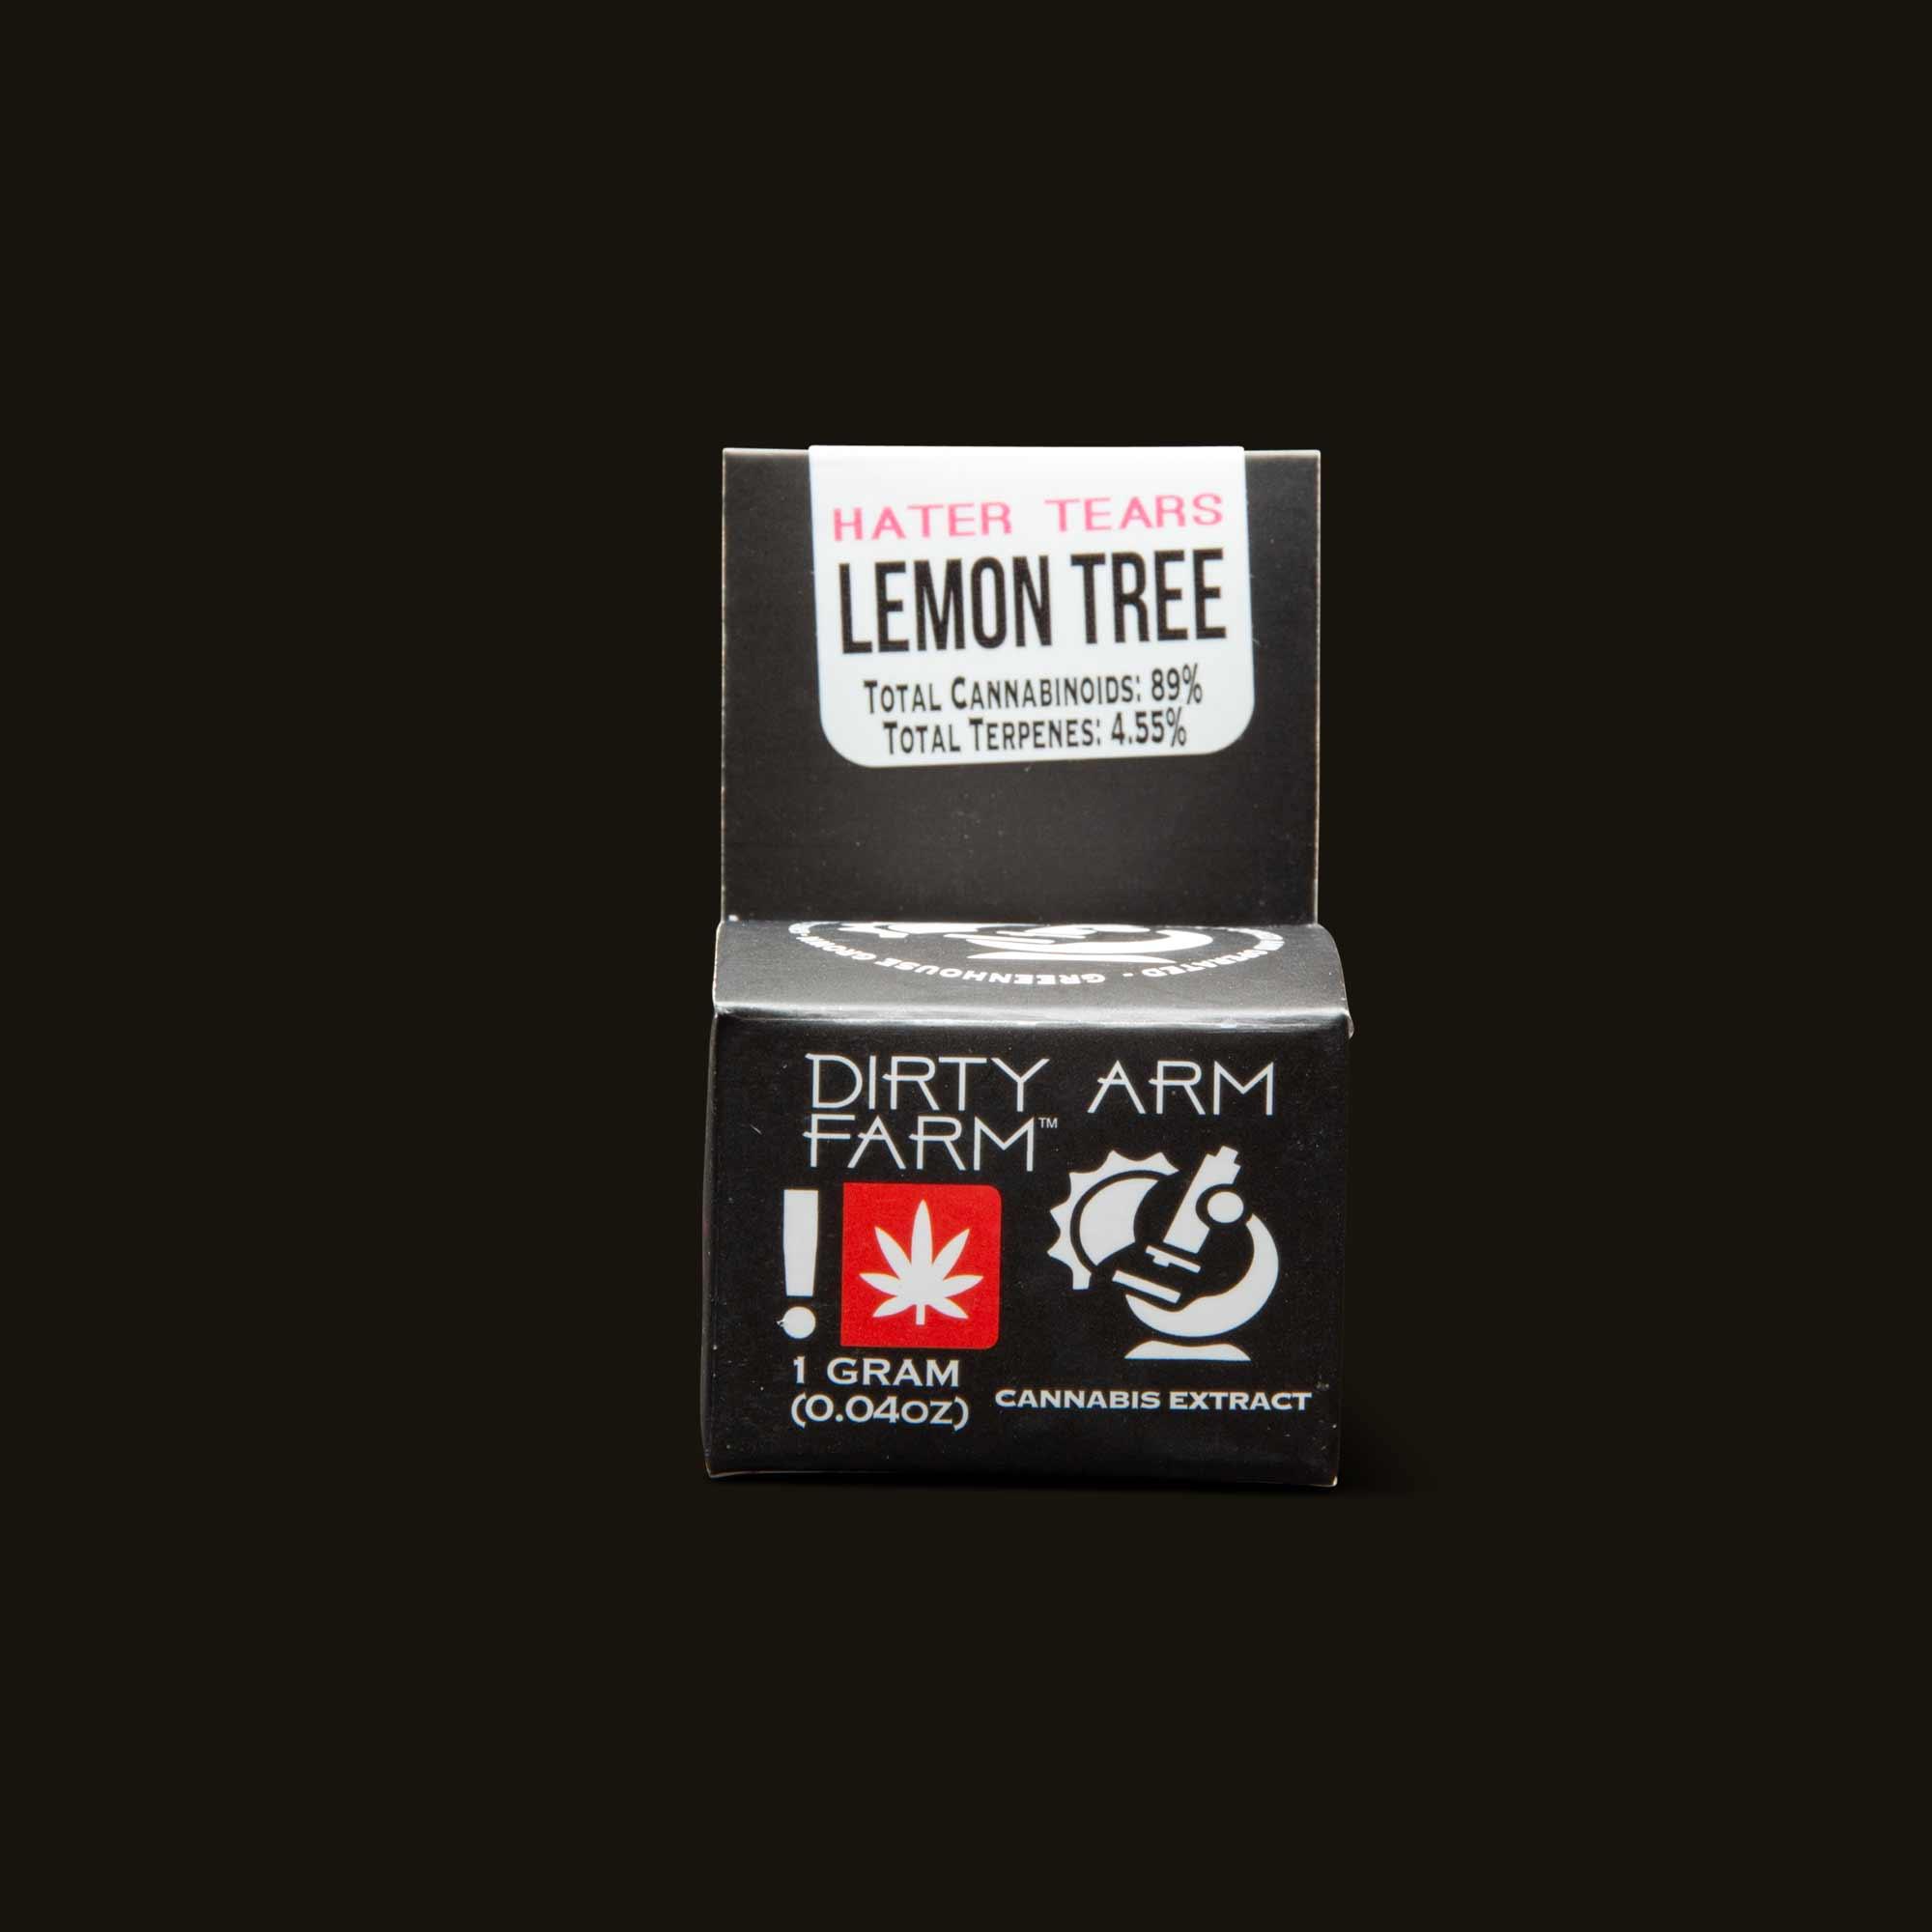 Dirty Arm Farm Lemon Tree Live Resin